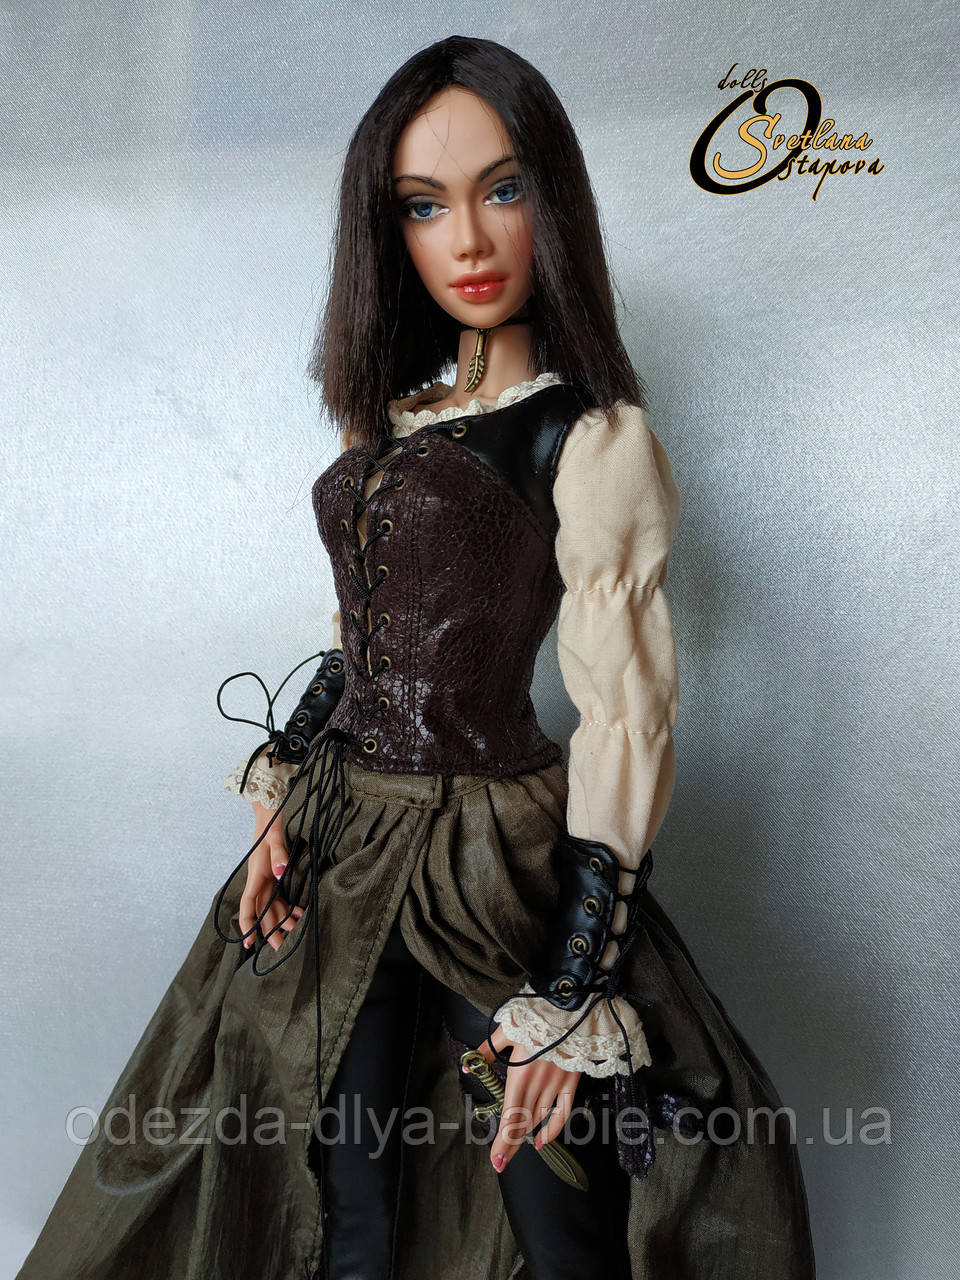 Авторская шарнирная кукла Ханна, МСД. Полиуретан